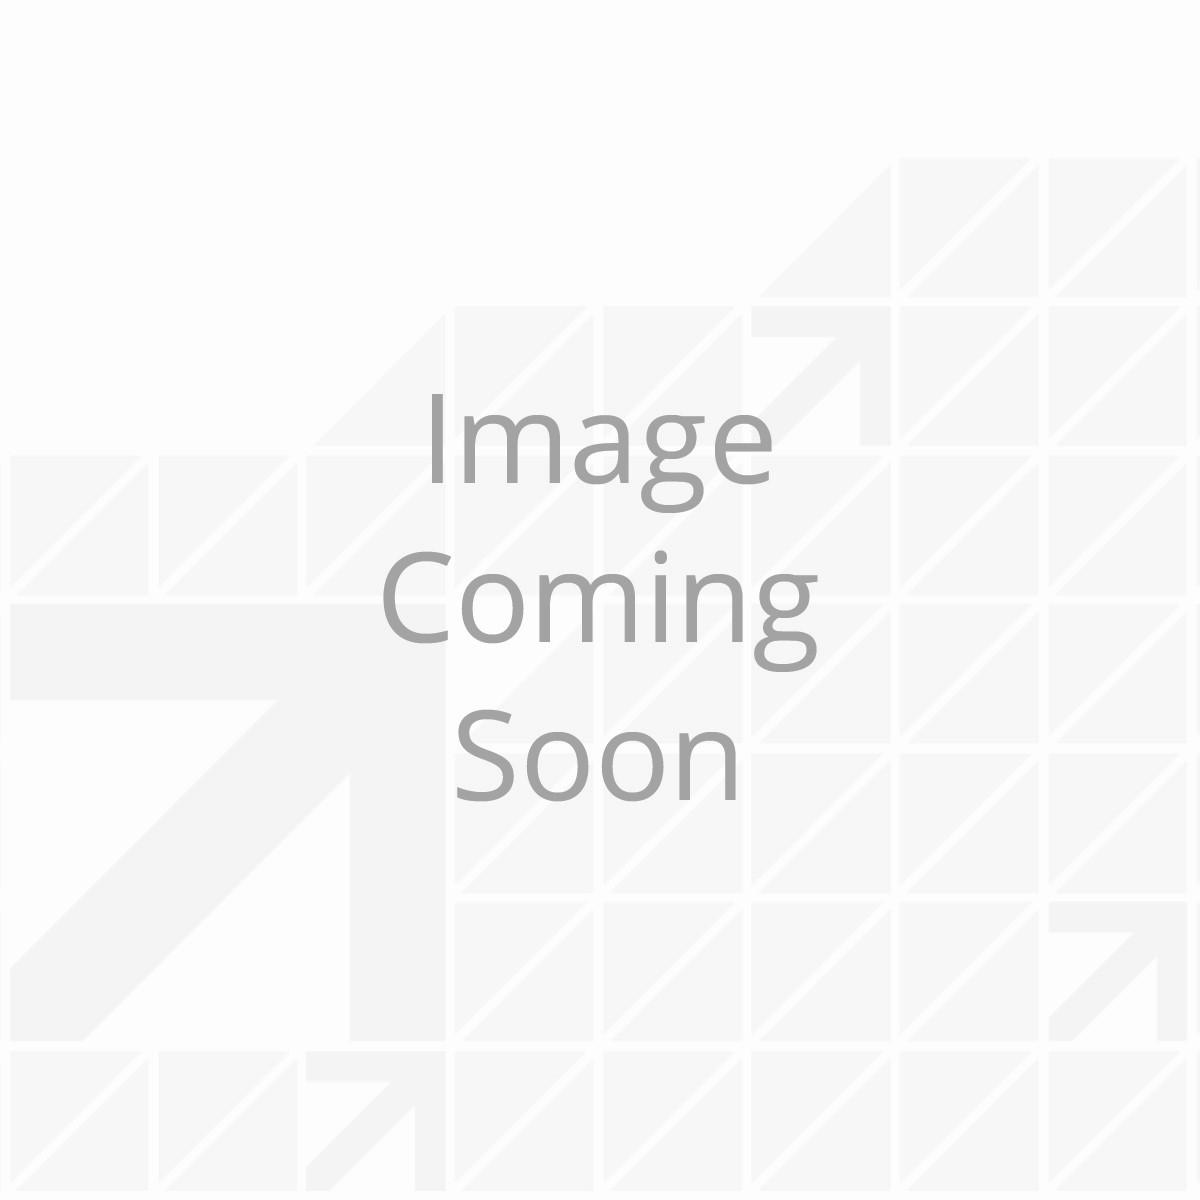 Awnbrella™ Adjuster Knob